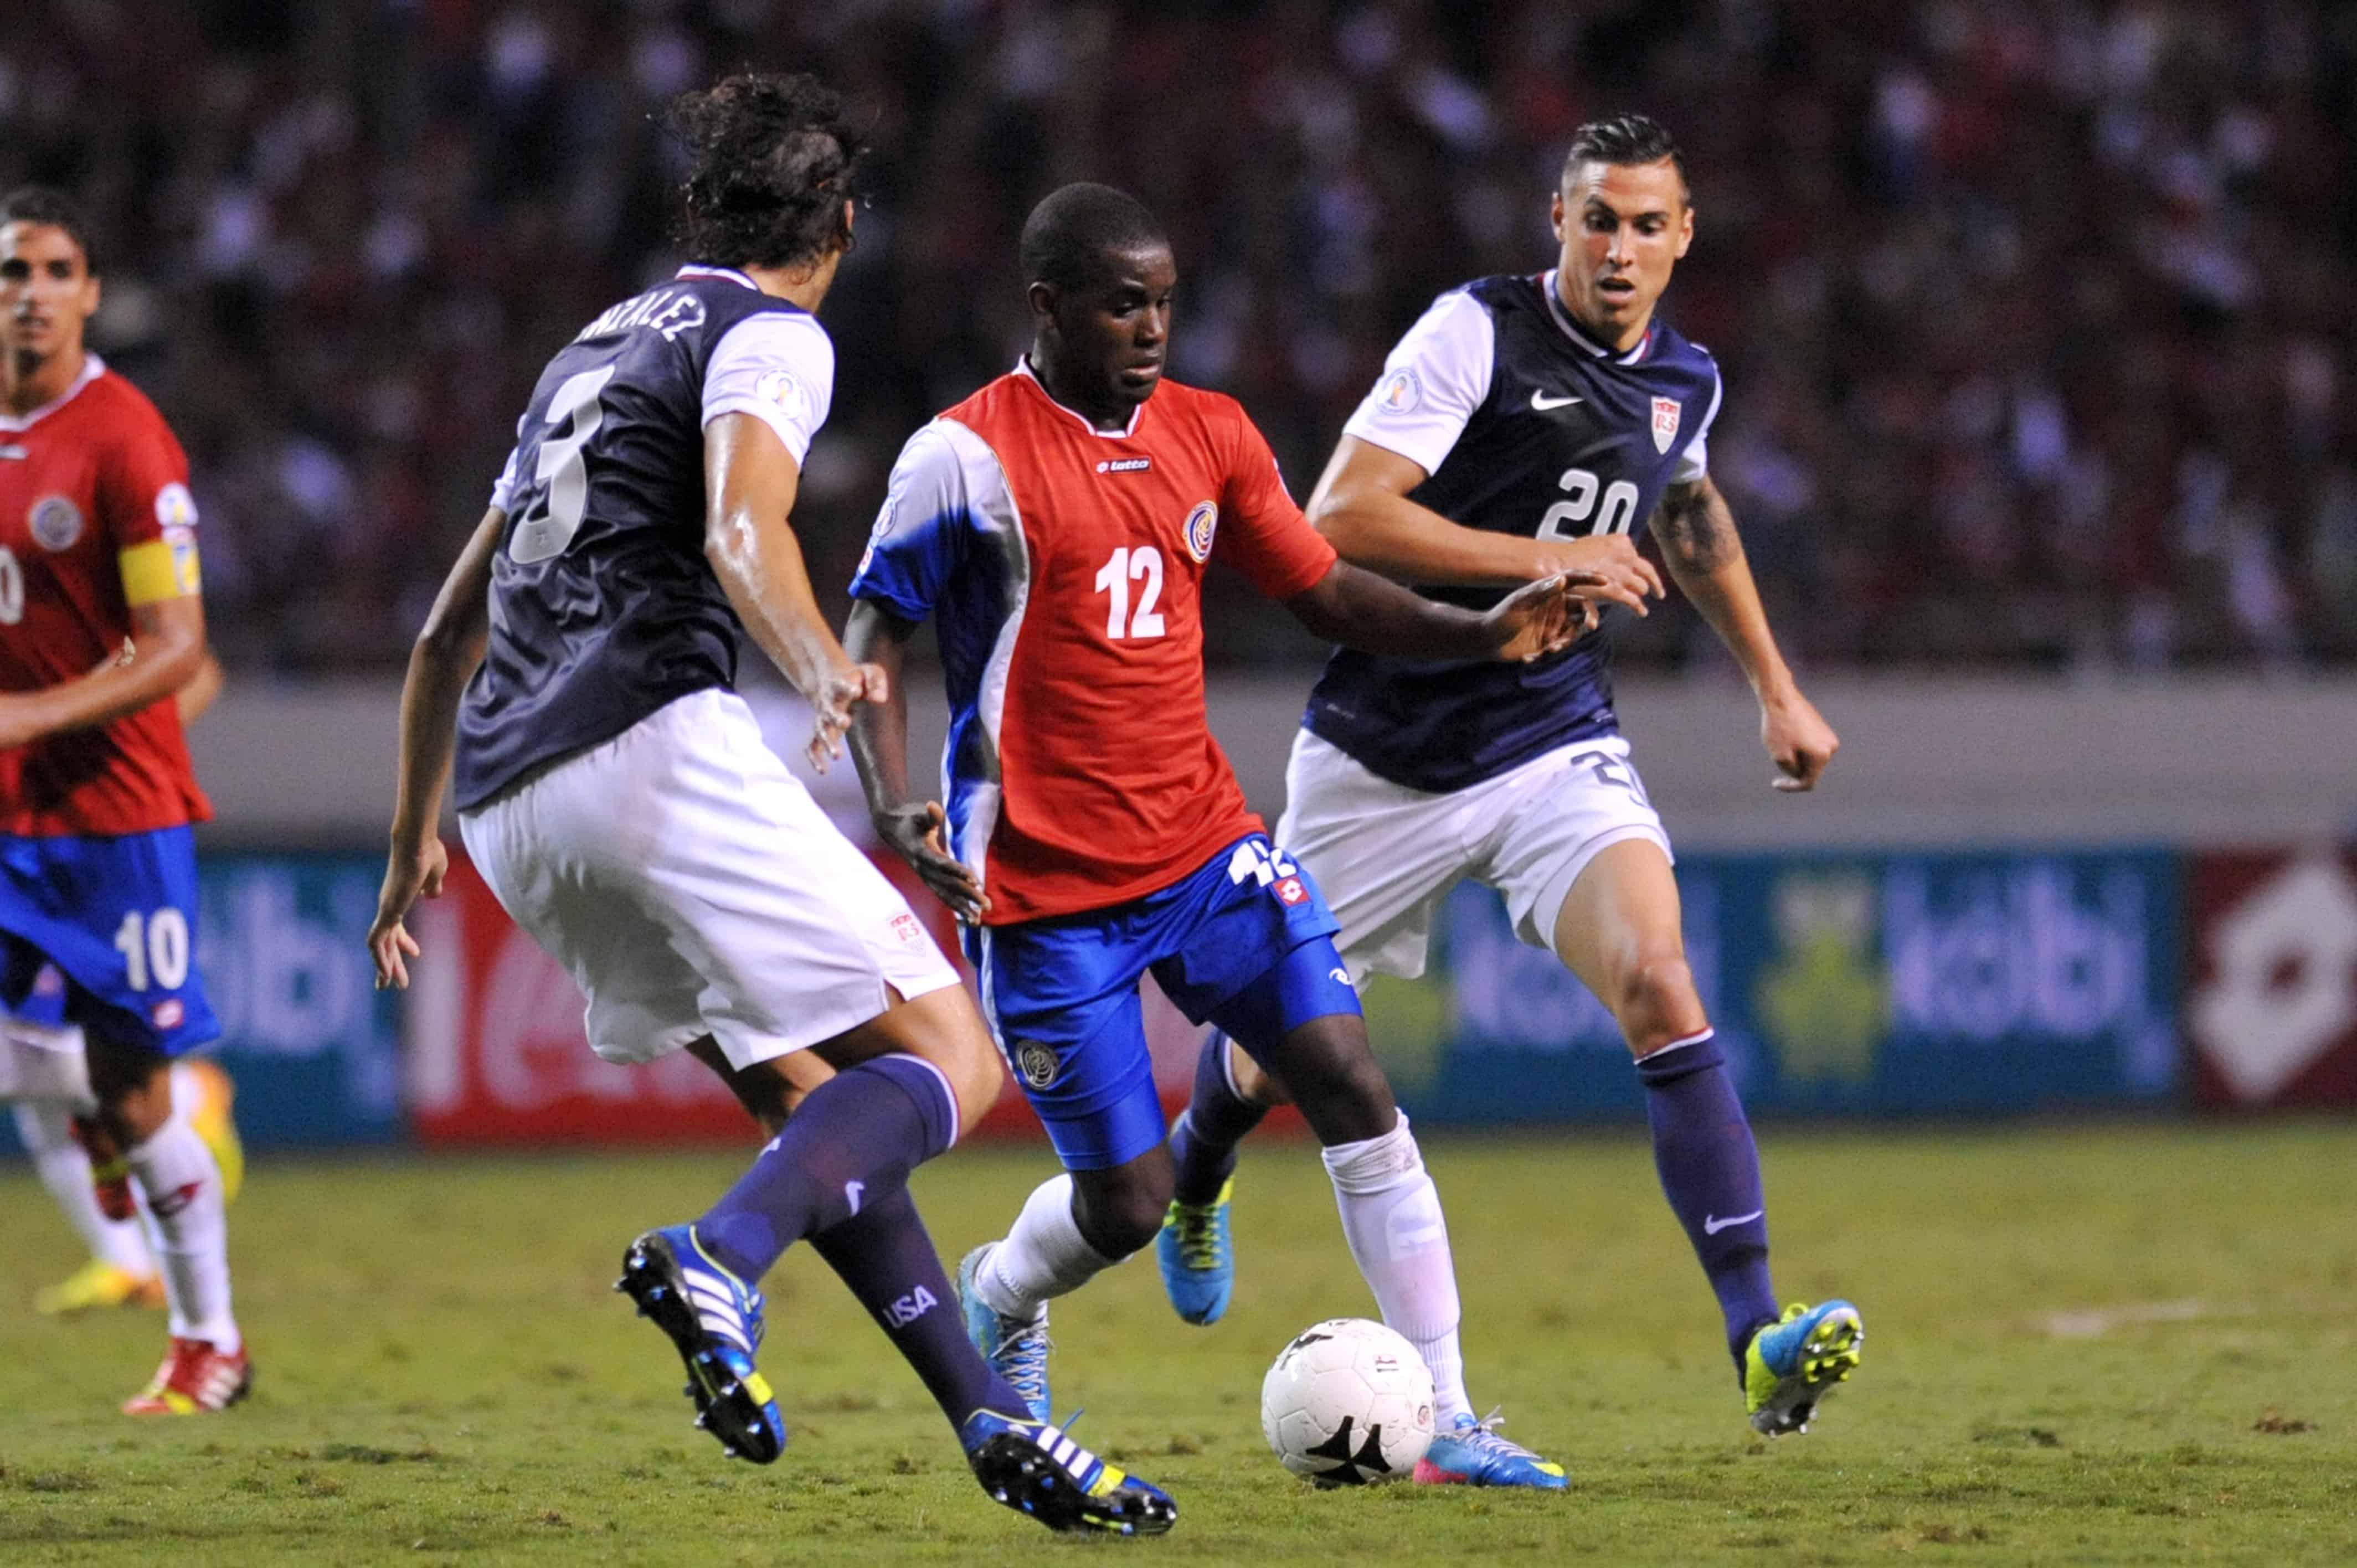 Costa Rica and U.S. football players